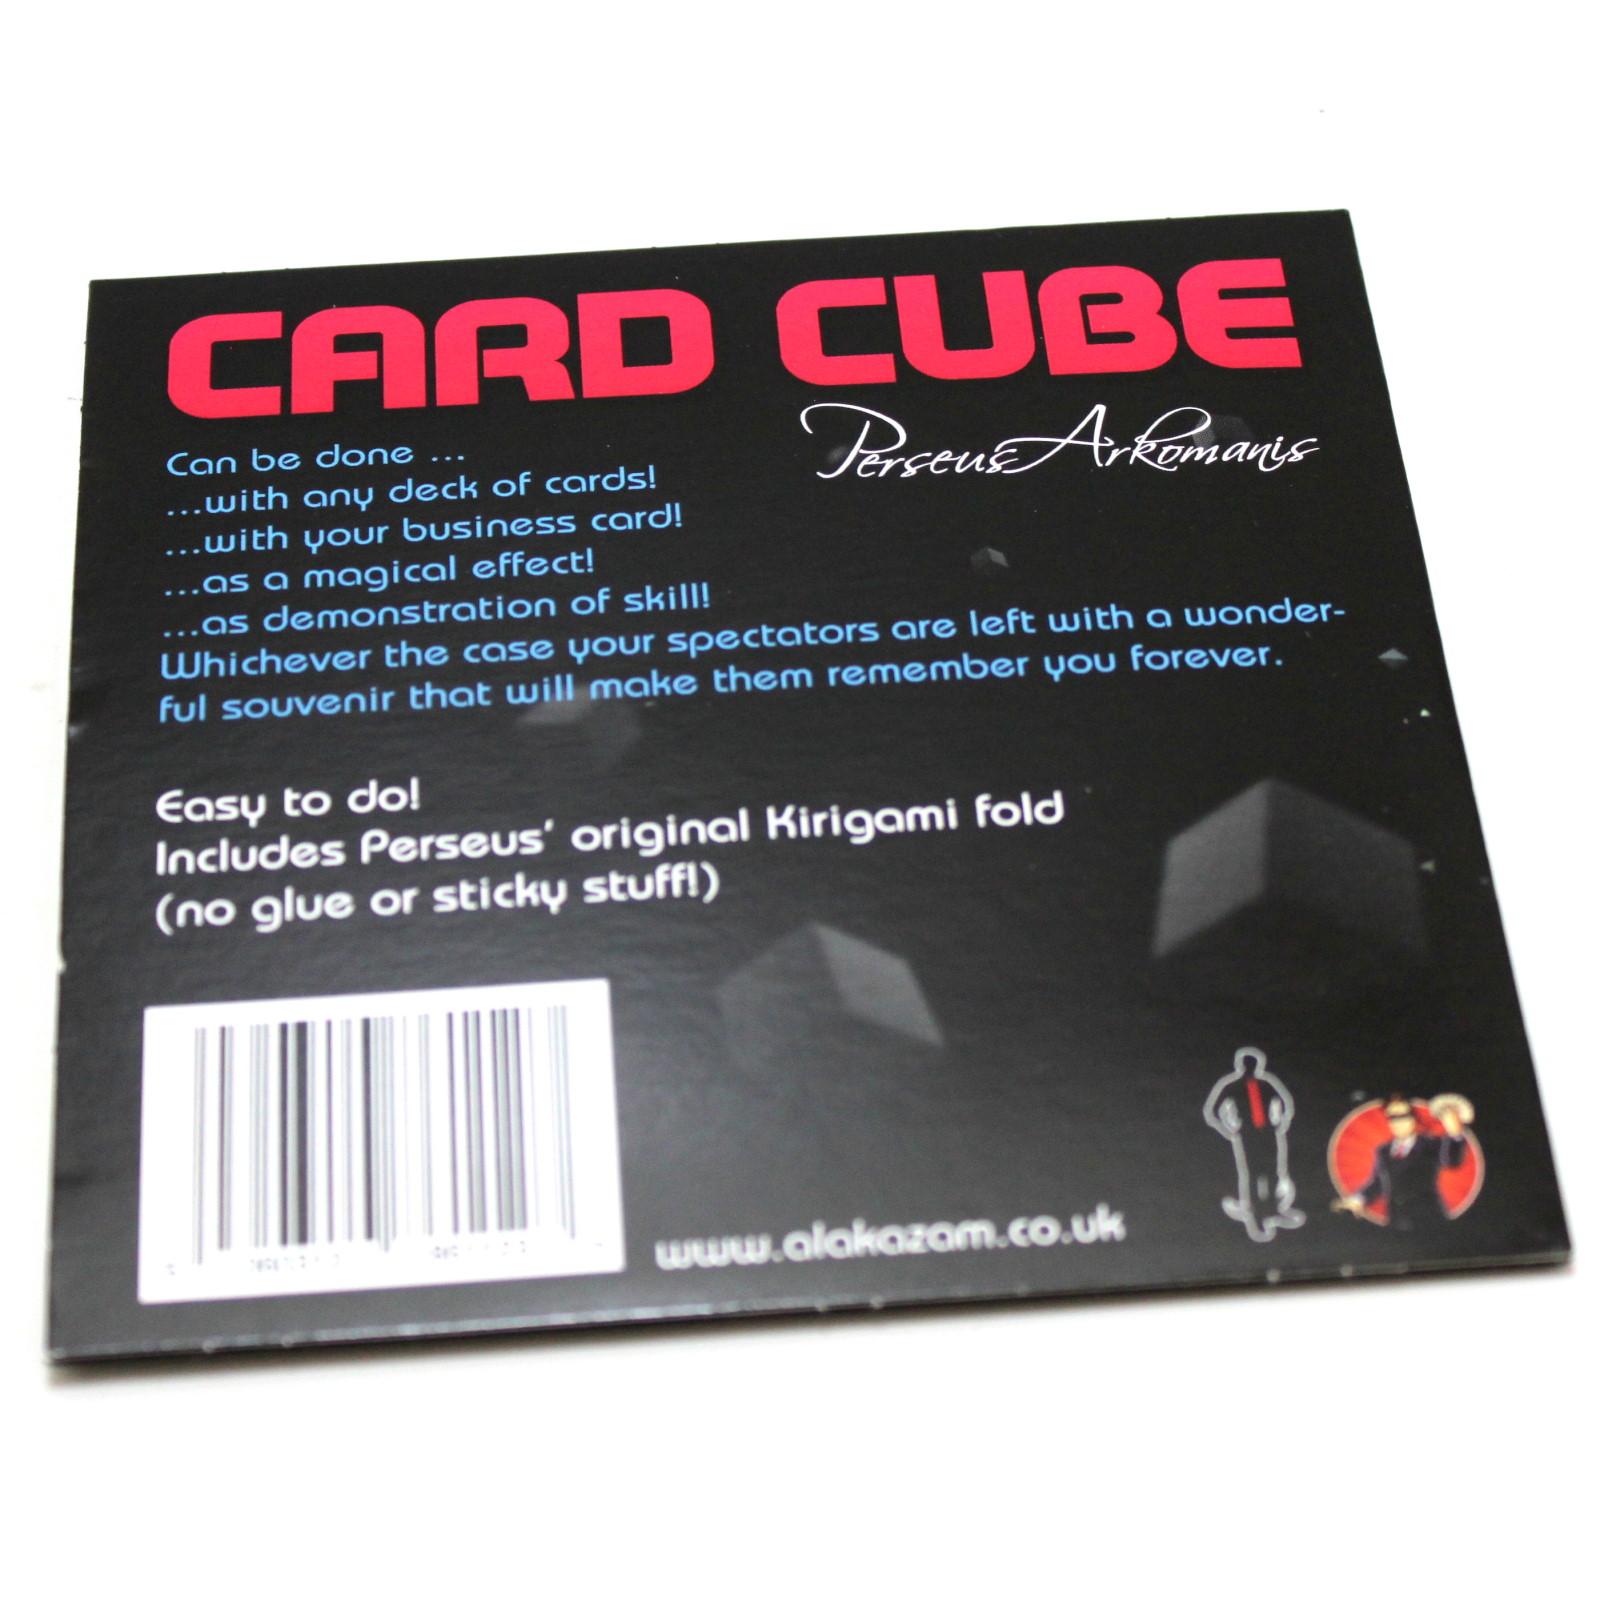 card cubeperseus arkomanis  martin's magic collection